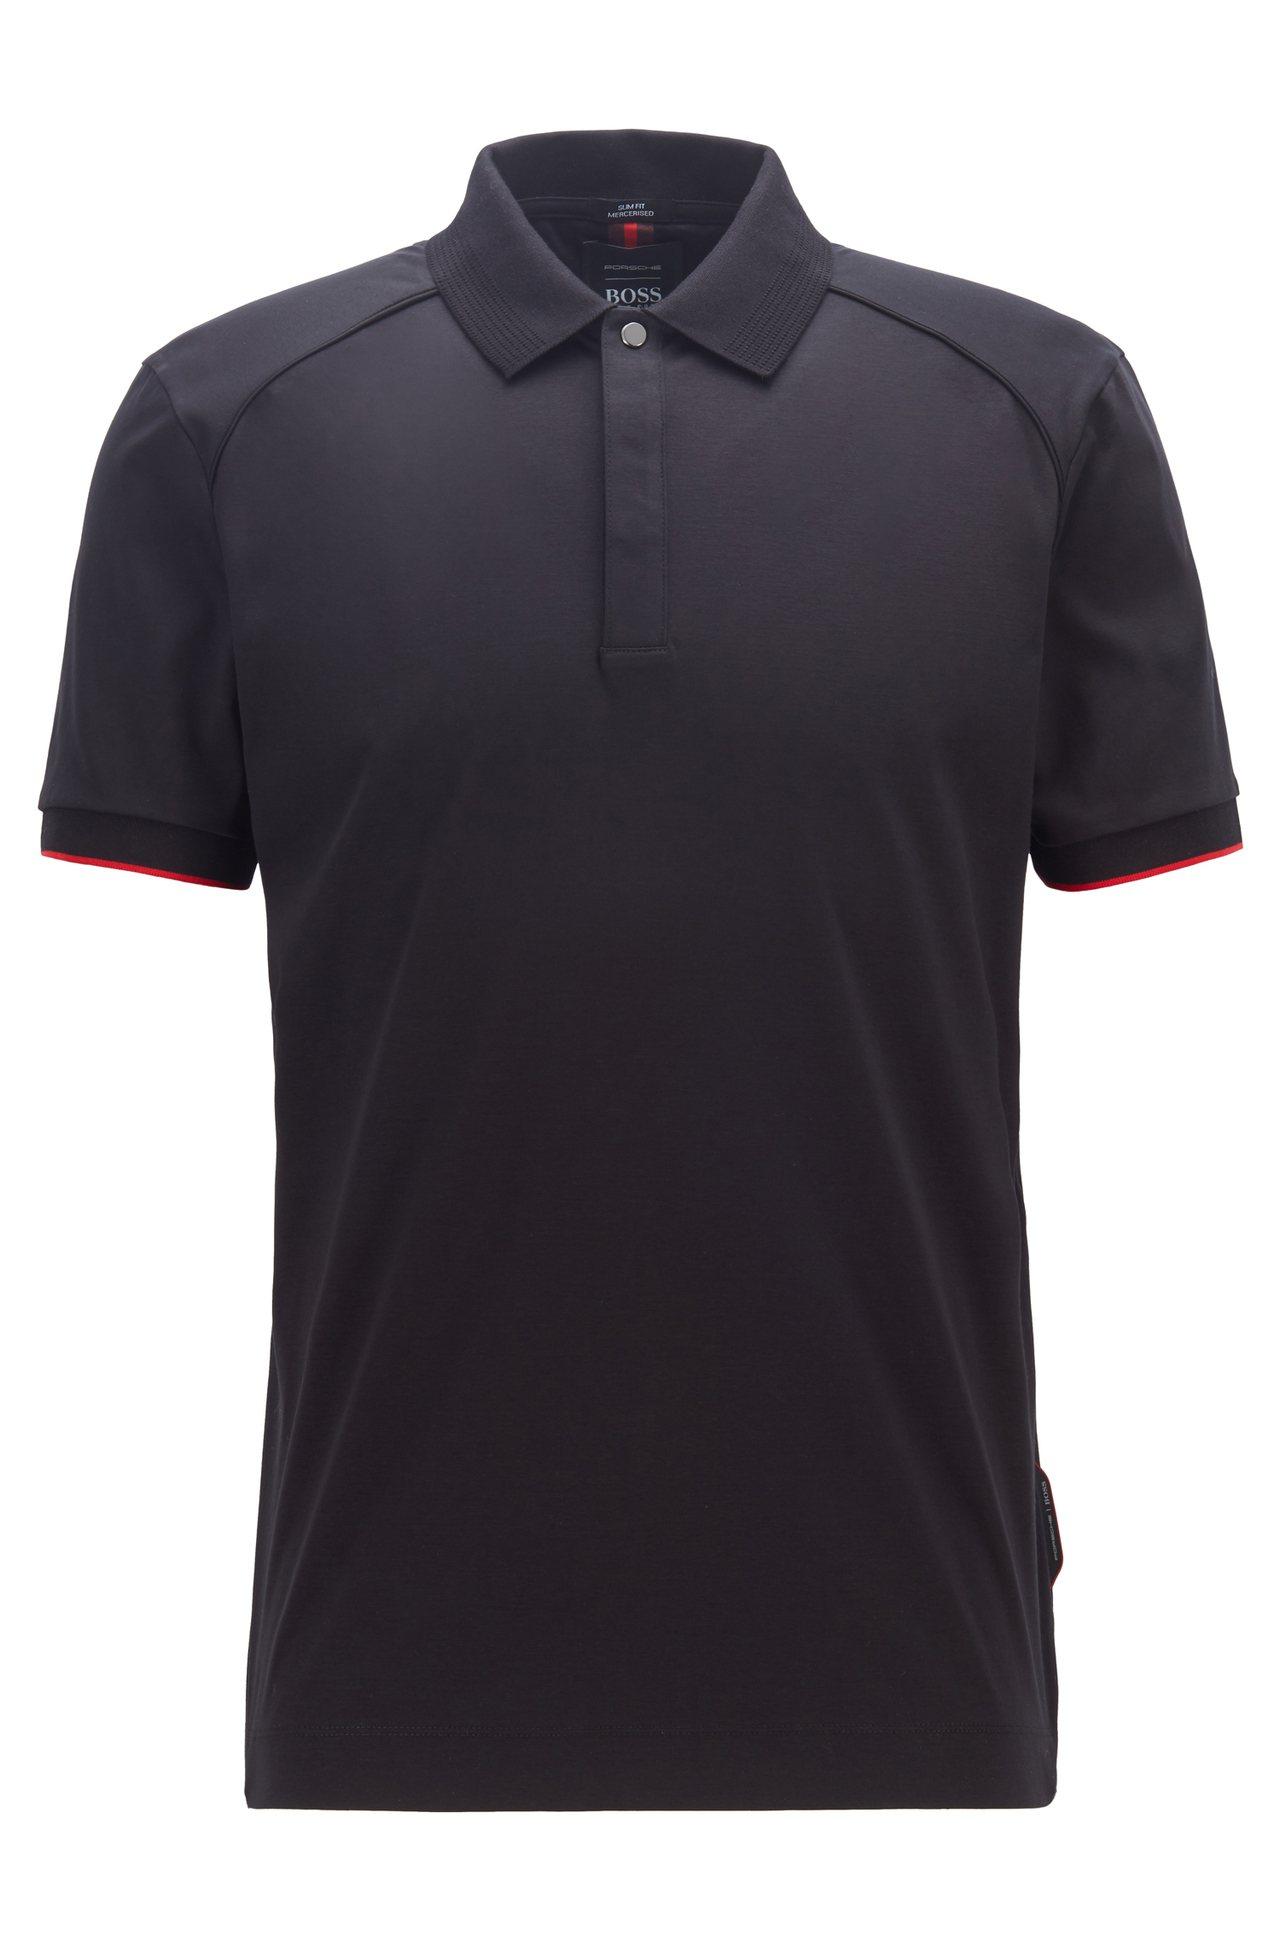 BOSS與保時捷聯名系列深藍色POLO衫,6,900元。圖/BOSS提供